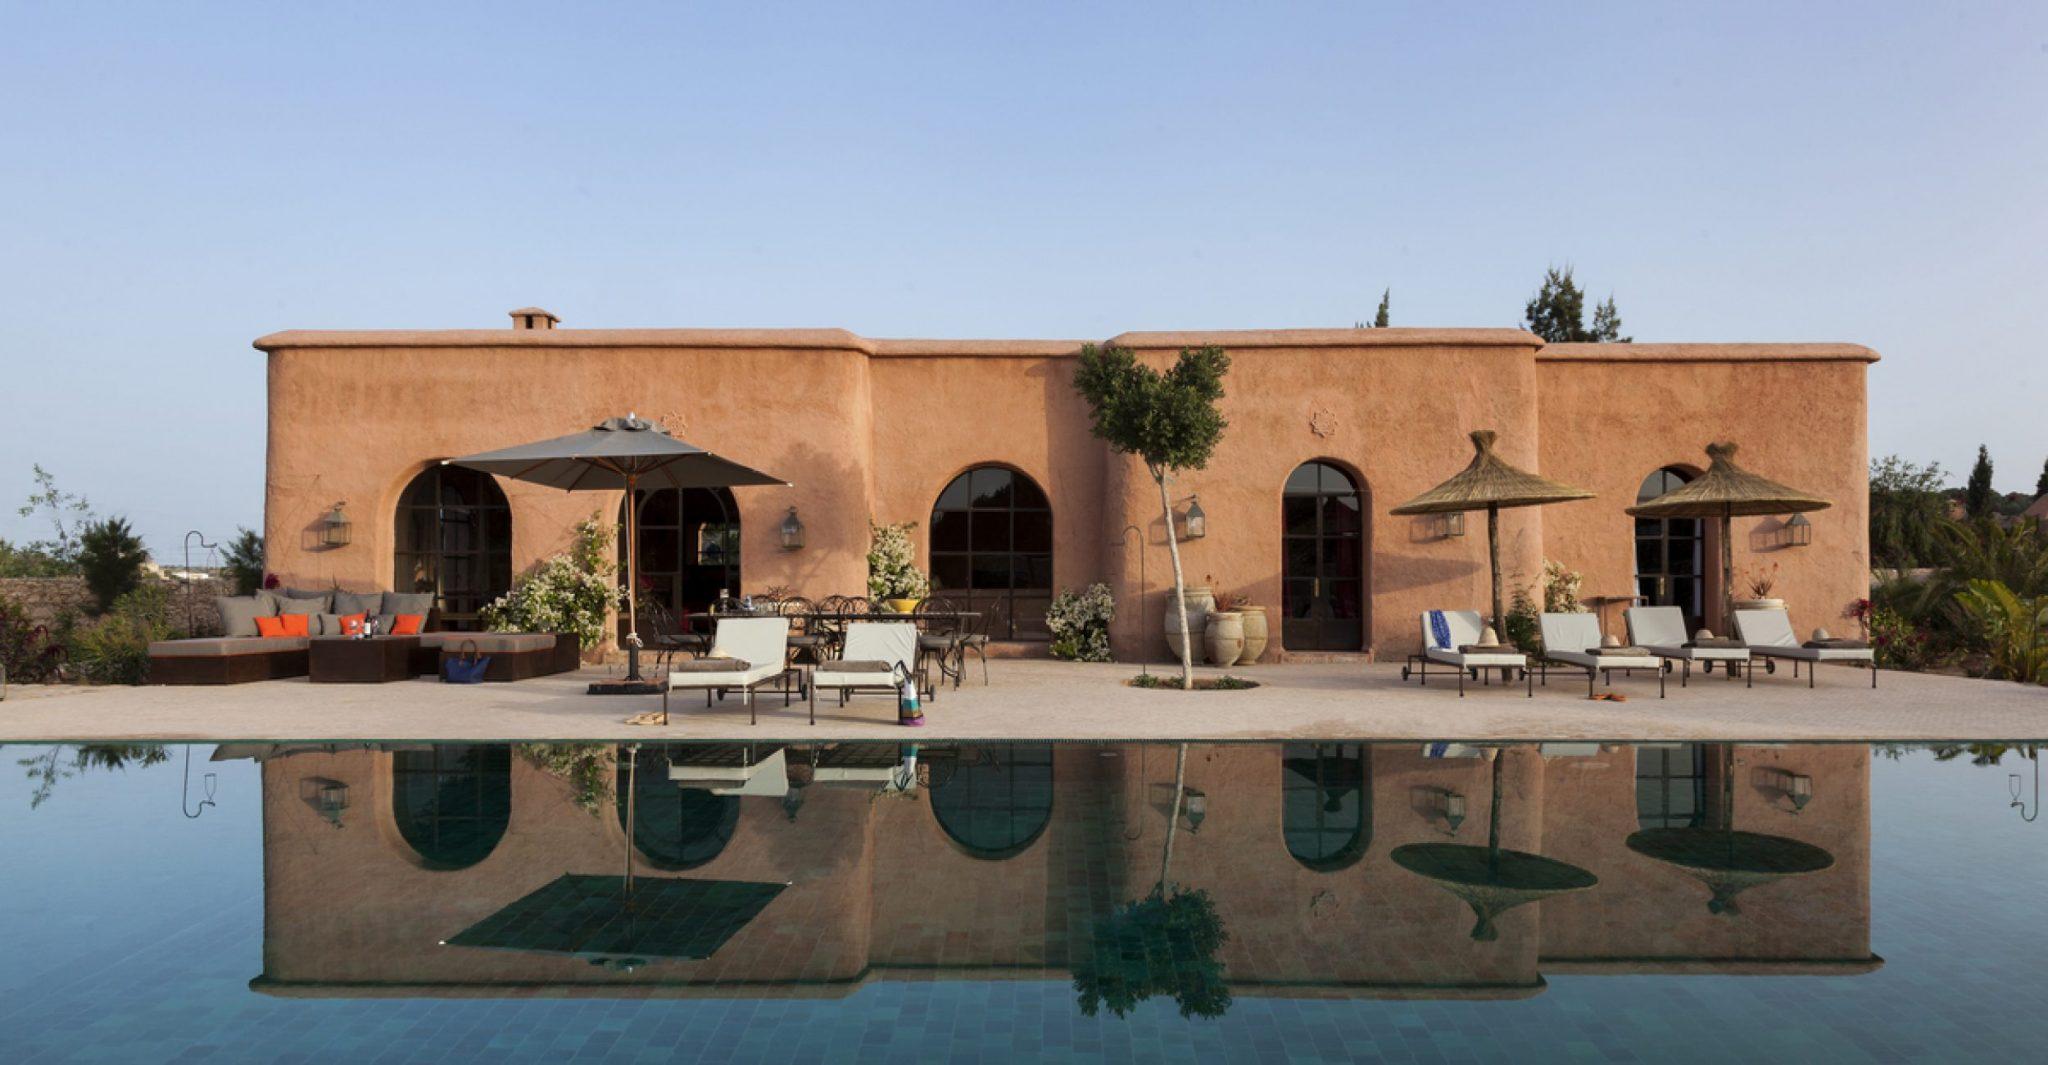 Villa patio a stunning villa in essaouira morocco to - Les jardins de villa maroc essaouira ...